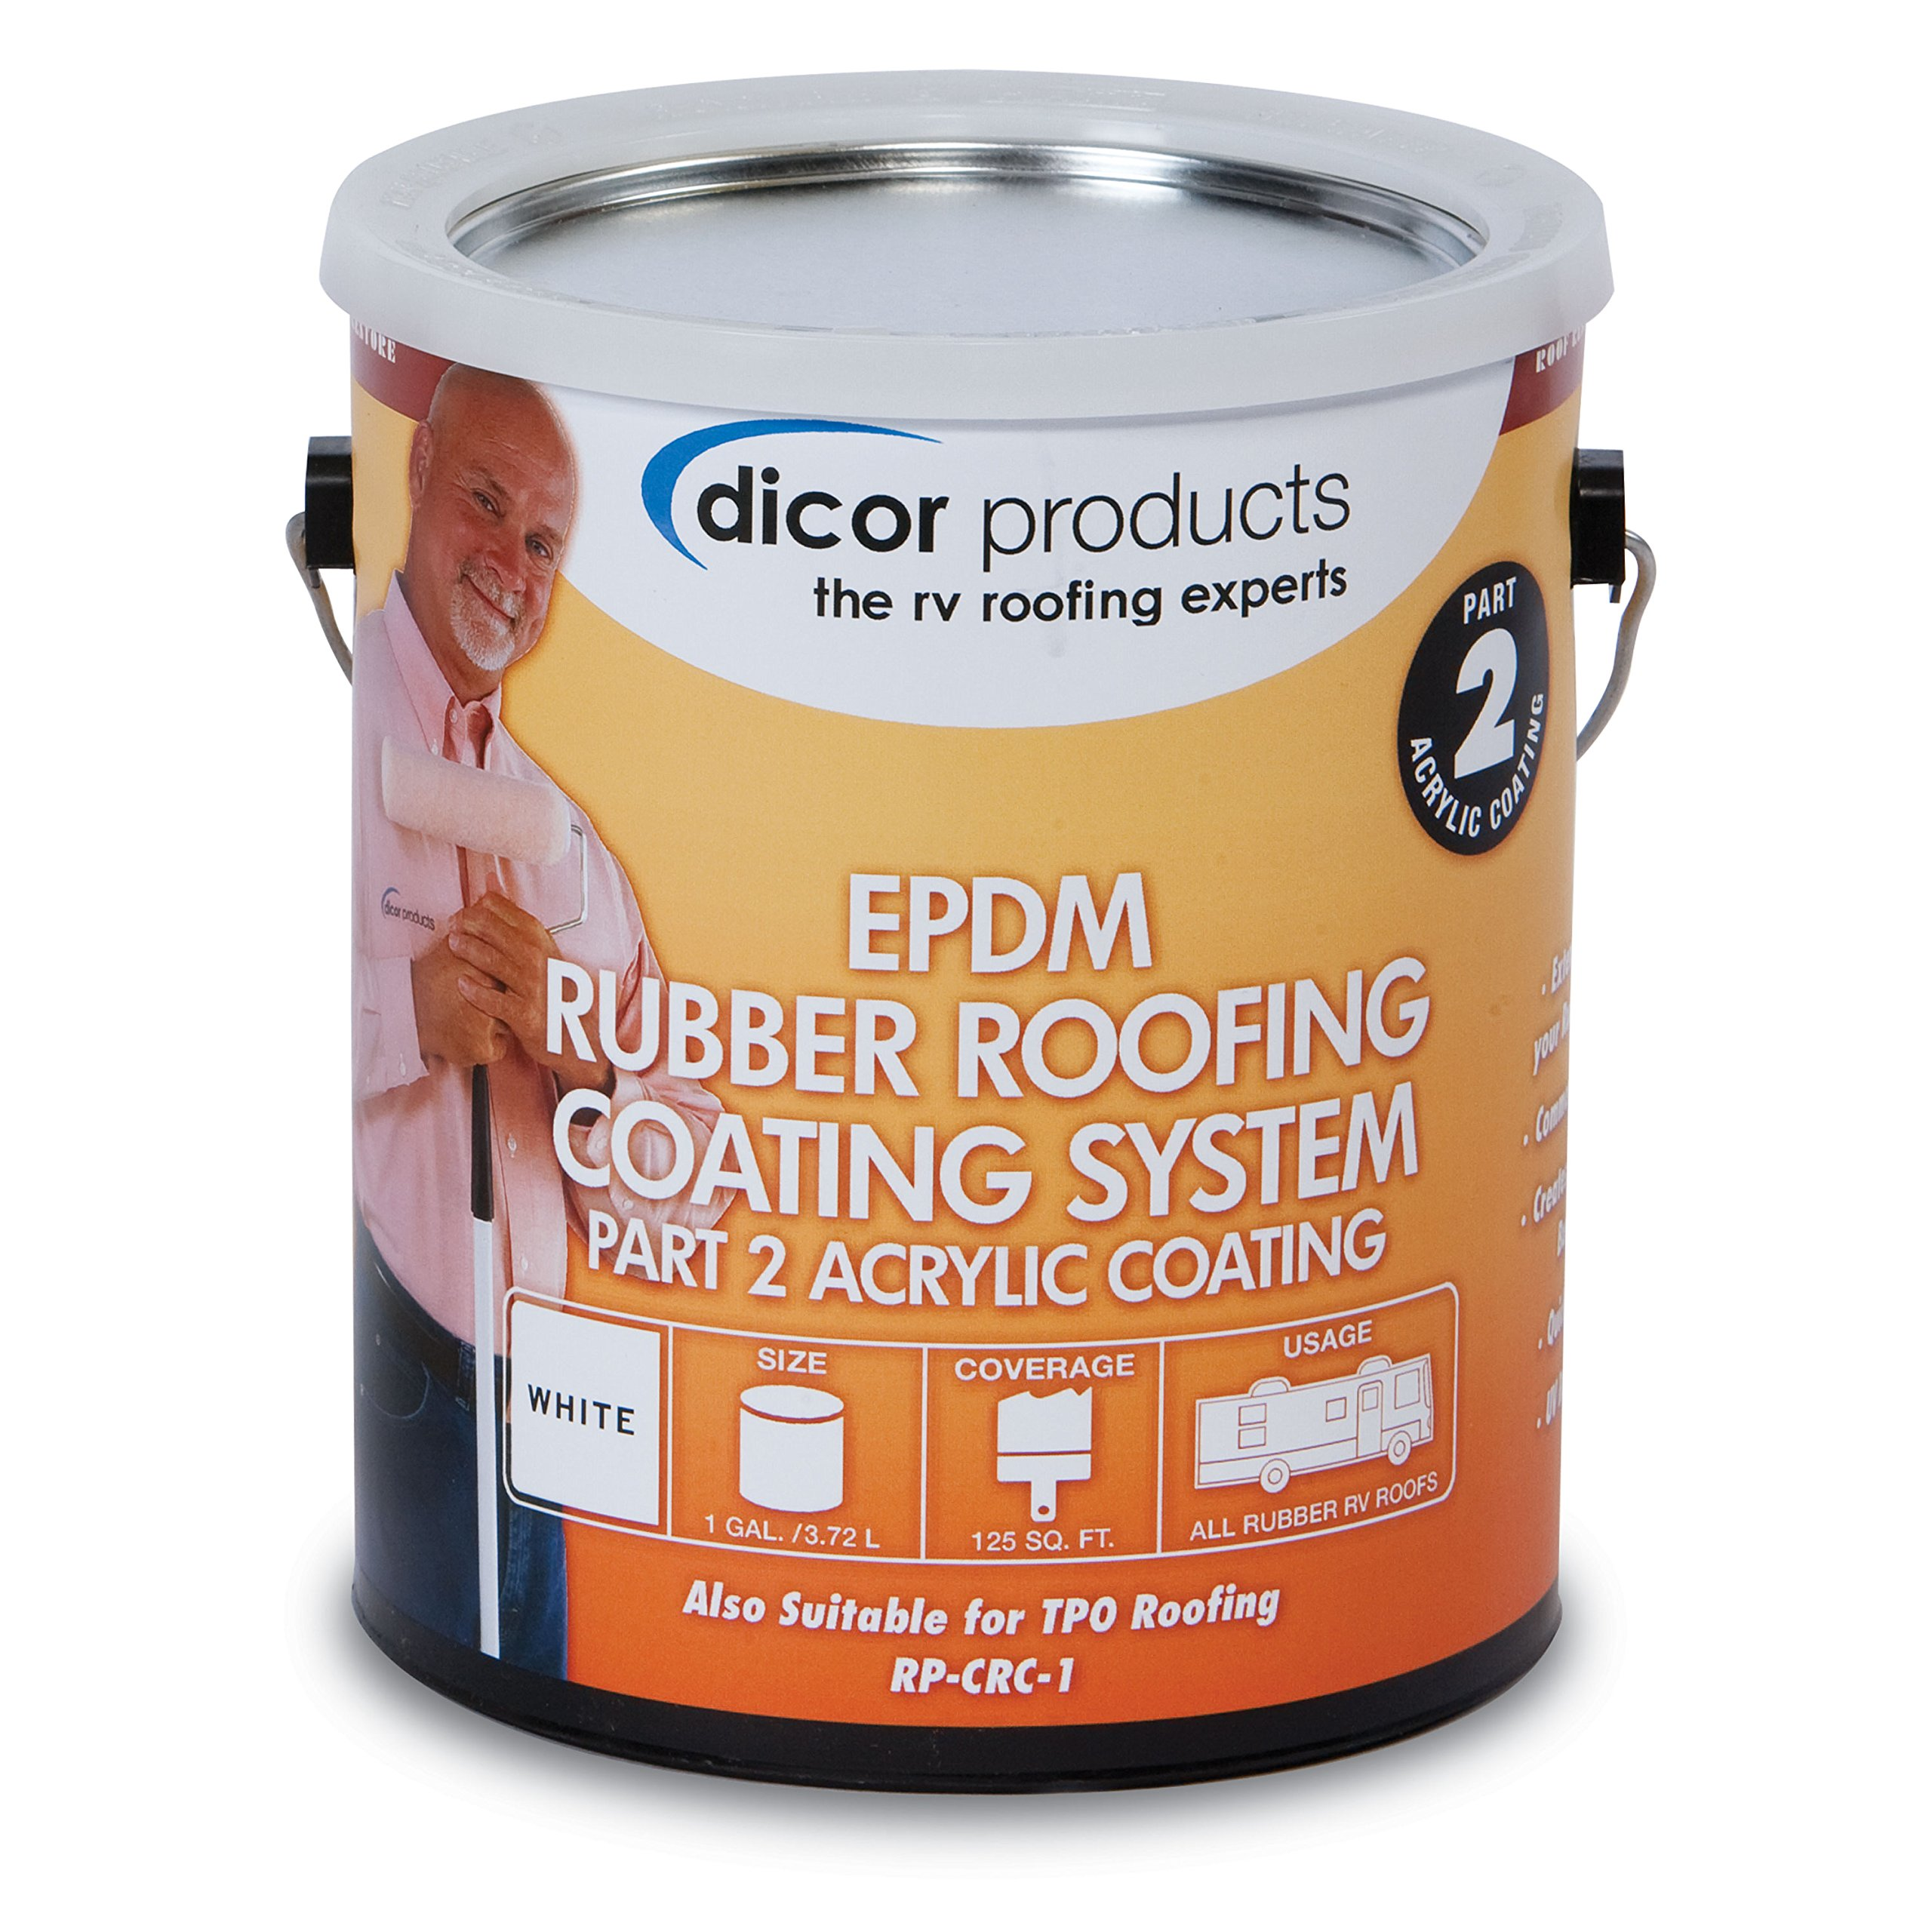 Dicor RP CRCT 1 EPDM Acrylic Coating